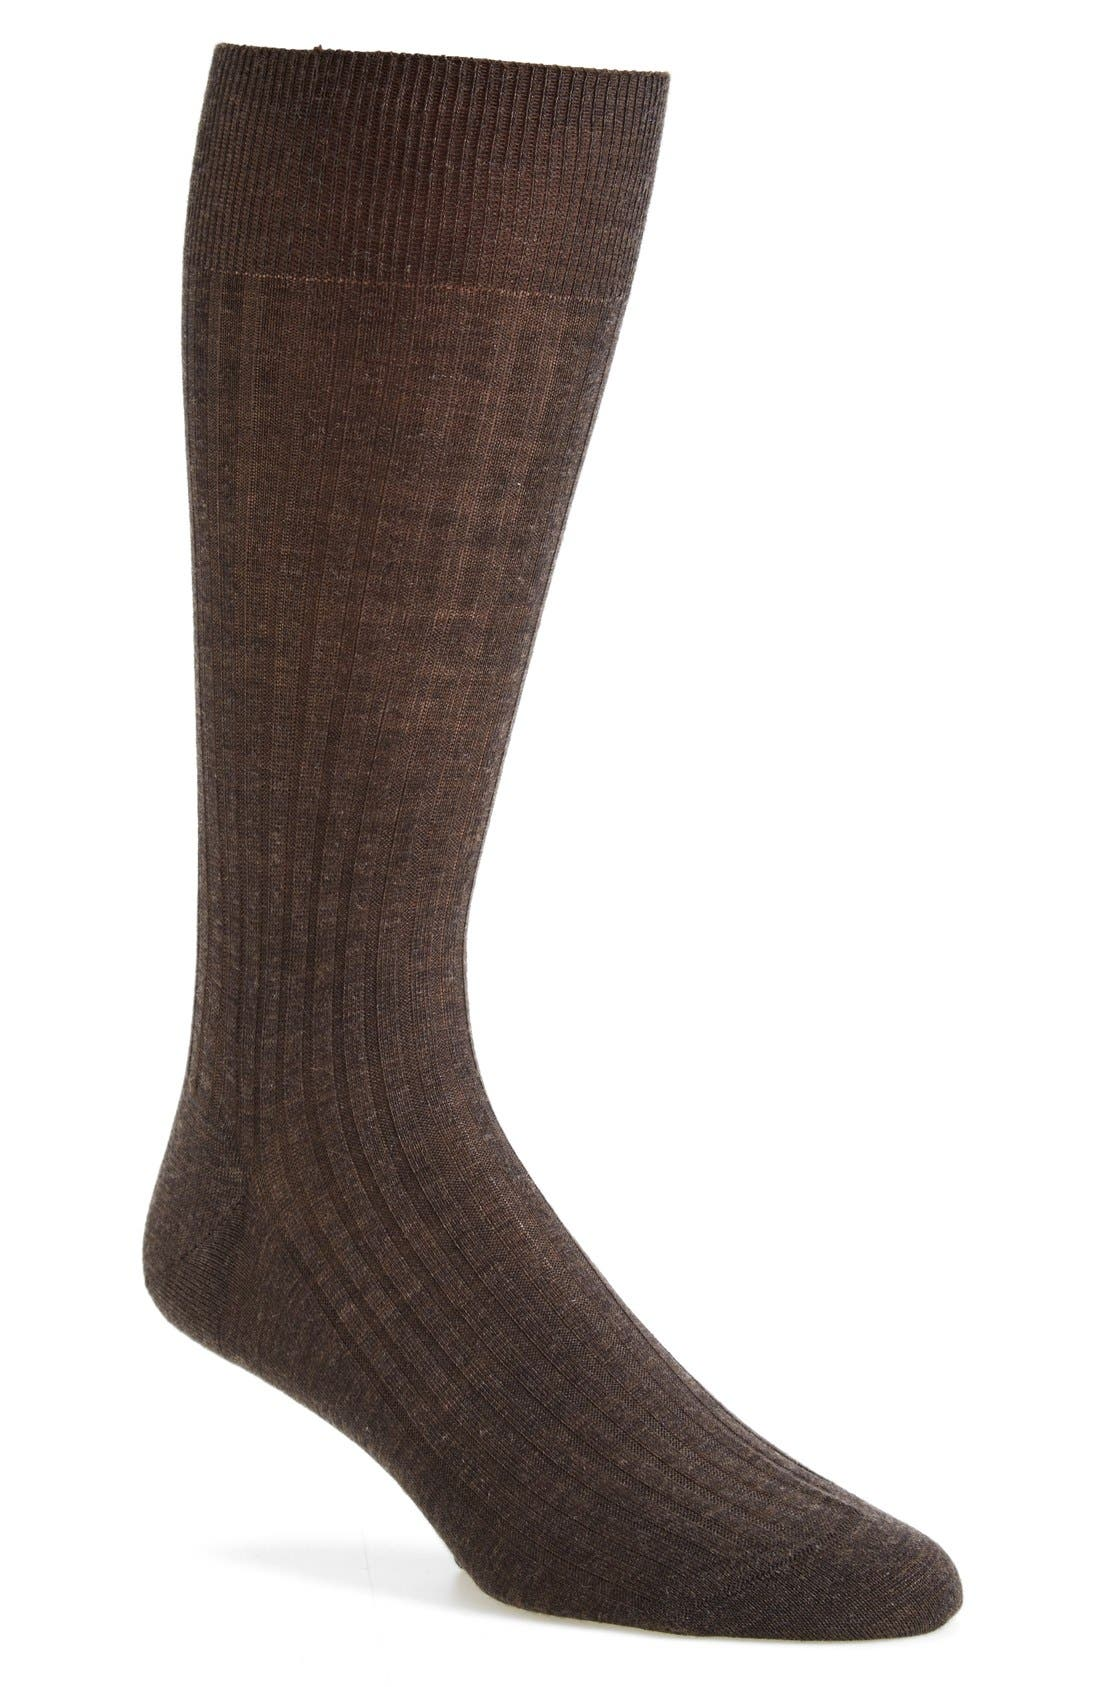 Merino Wool Blend Socks,                         Main,                         color, DARK BROWN MIX